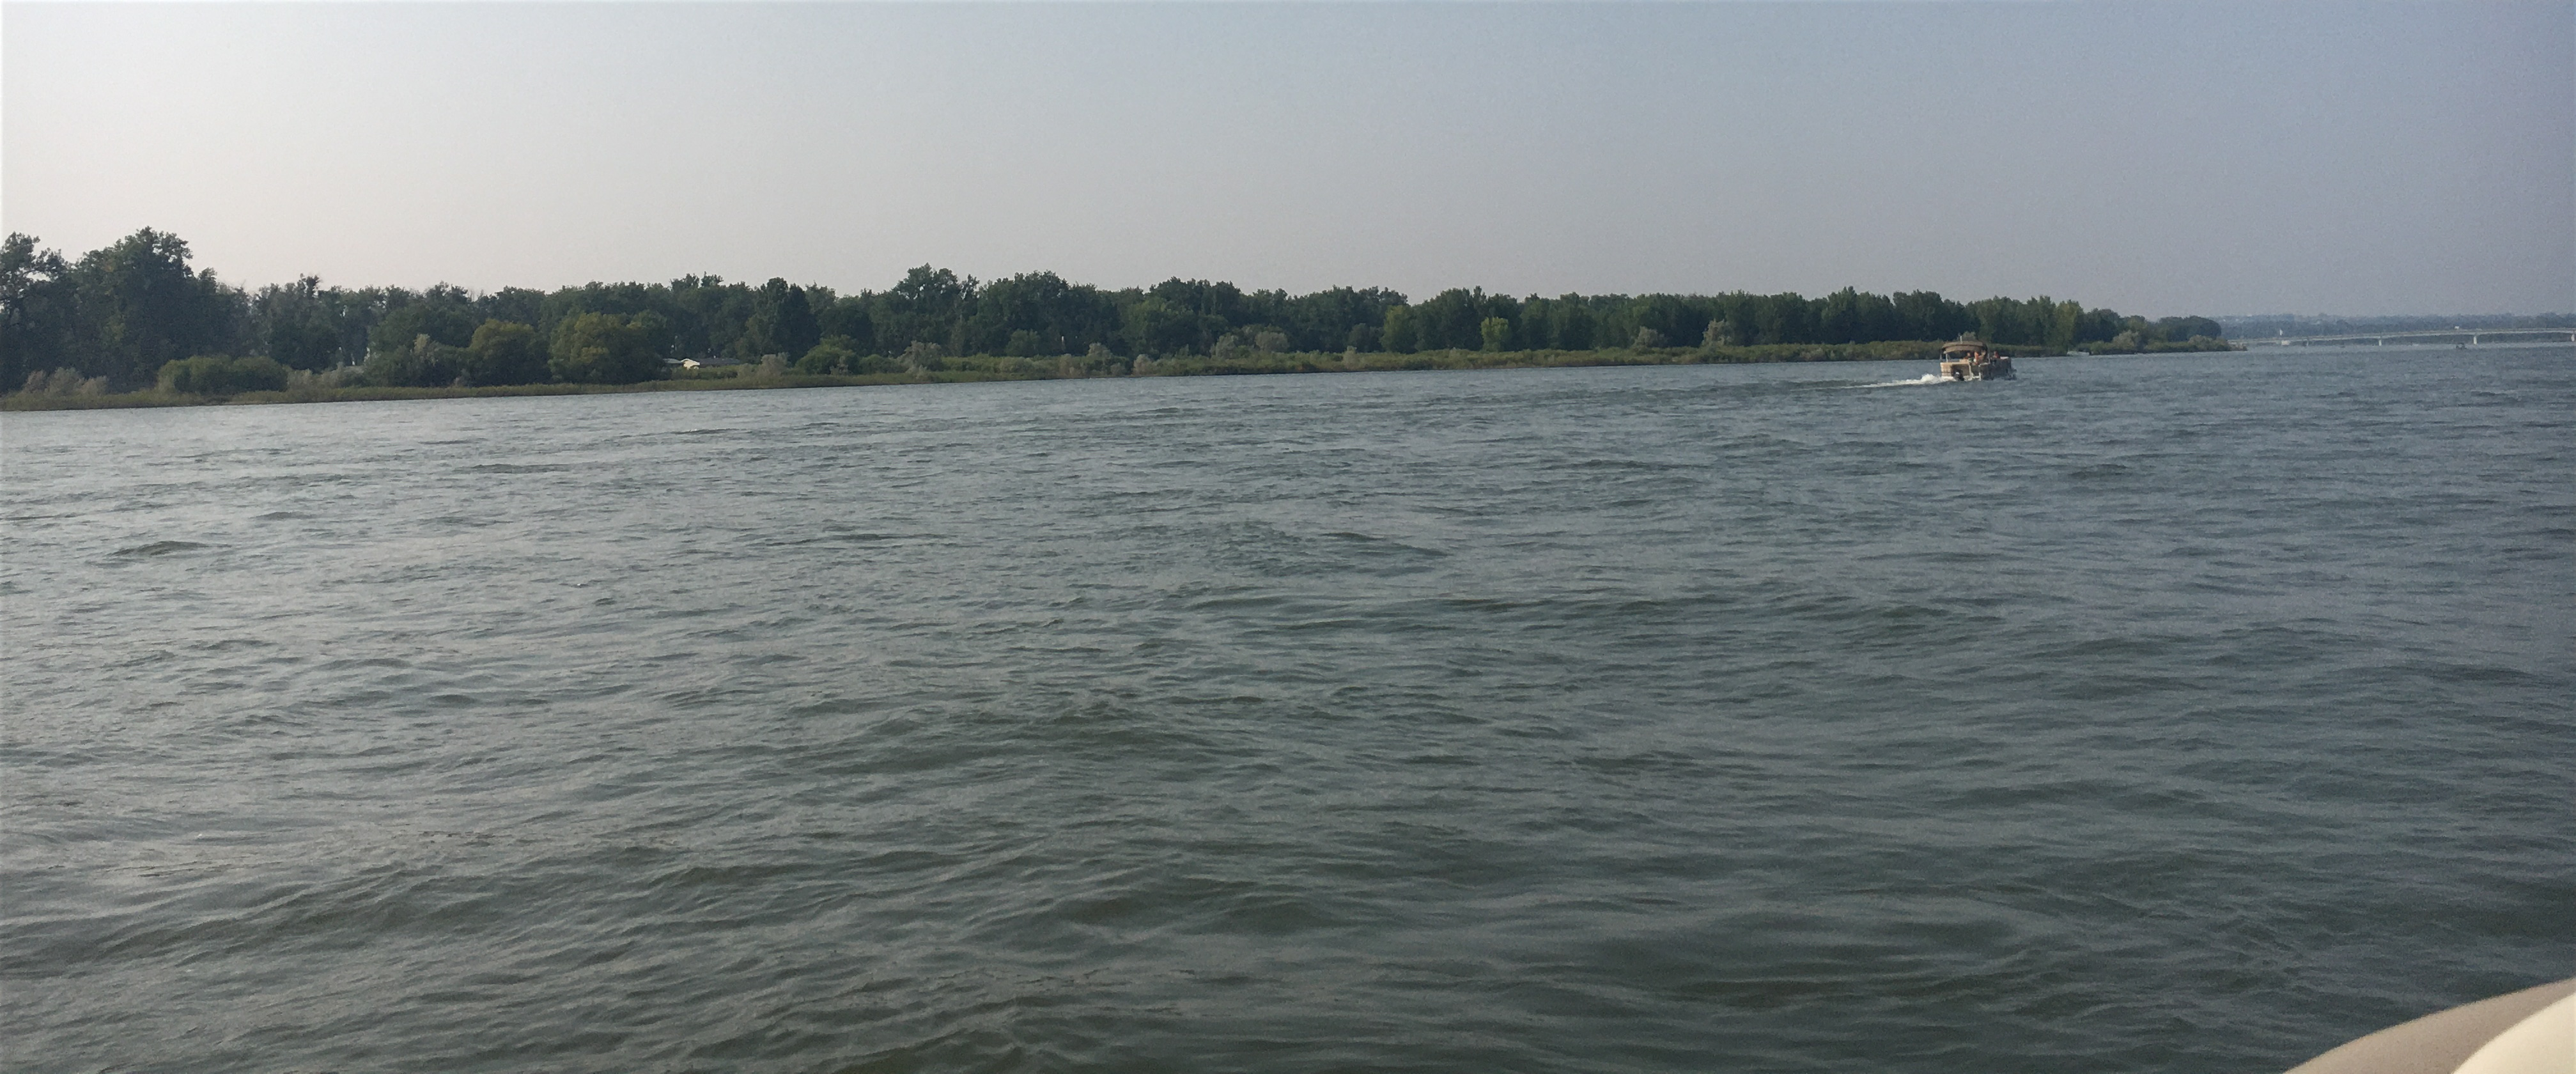 Out on the Missouri River in Bismarck, North Dakota.